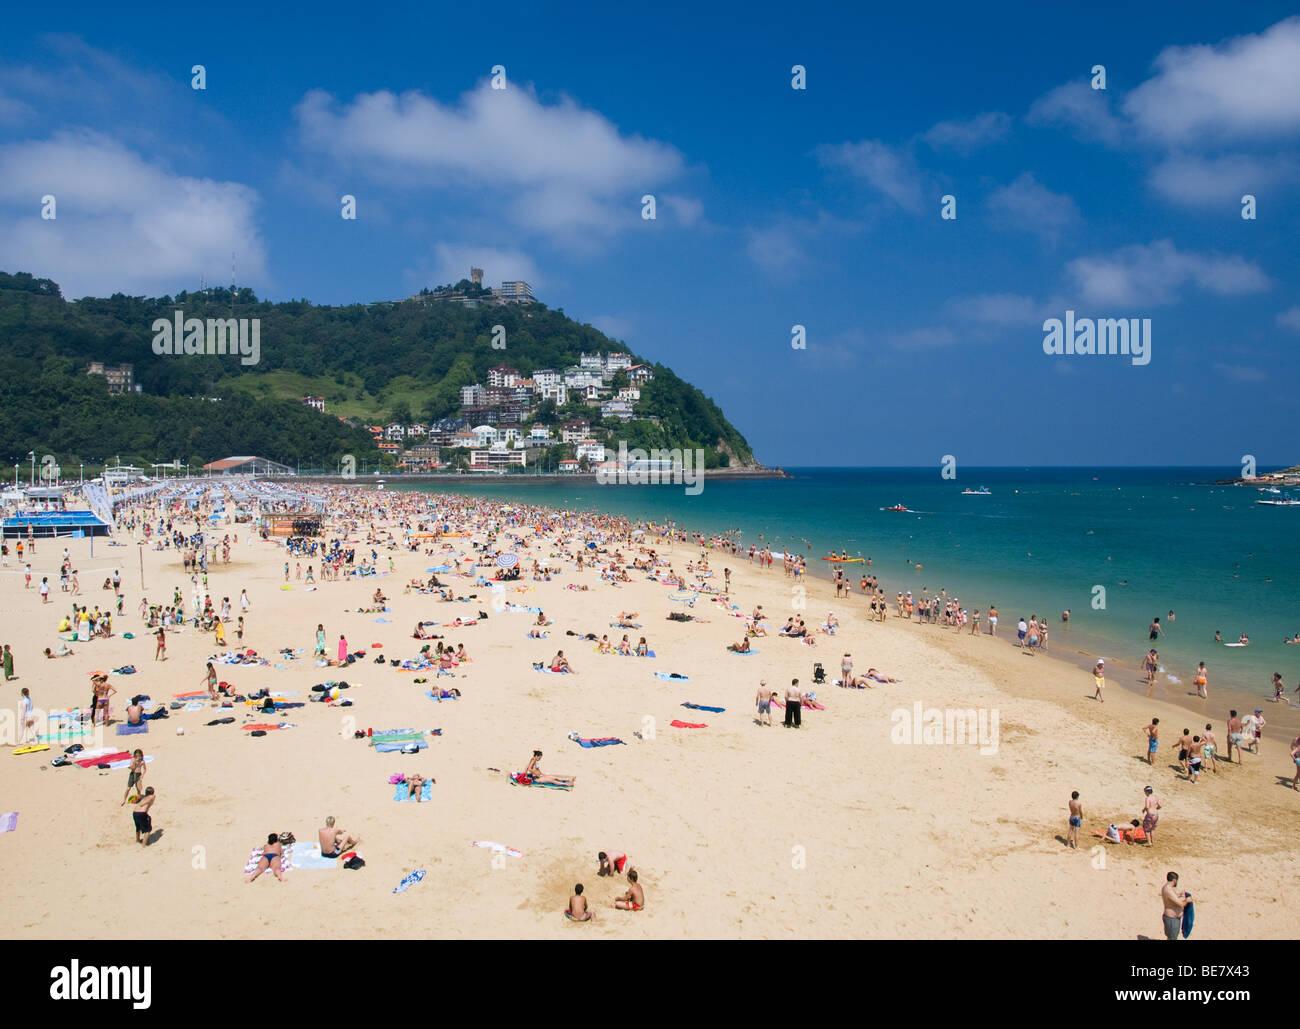 Ondarreta Beach at La Concha Bay in San Sebastian-Donostia, Spain, on a hot summer day. - Stock Image